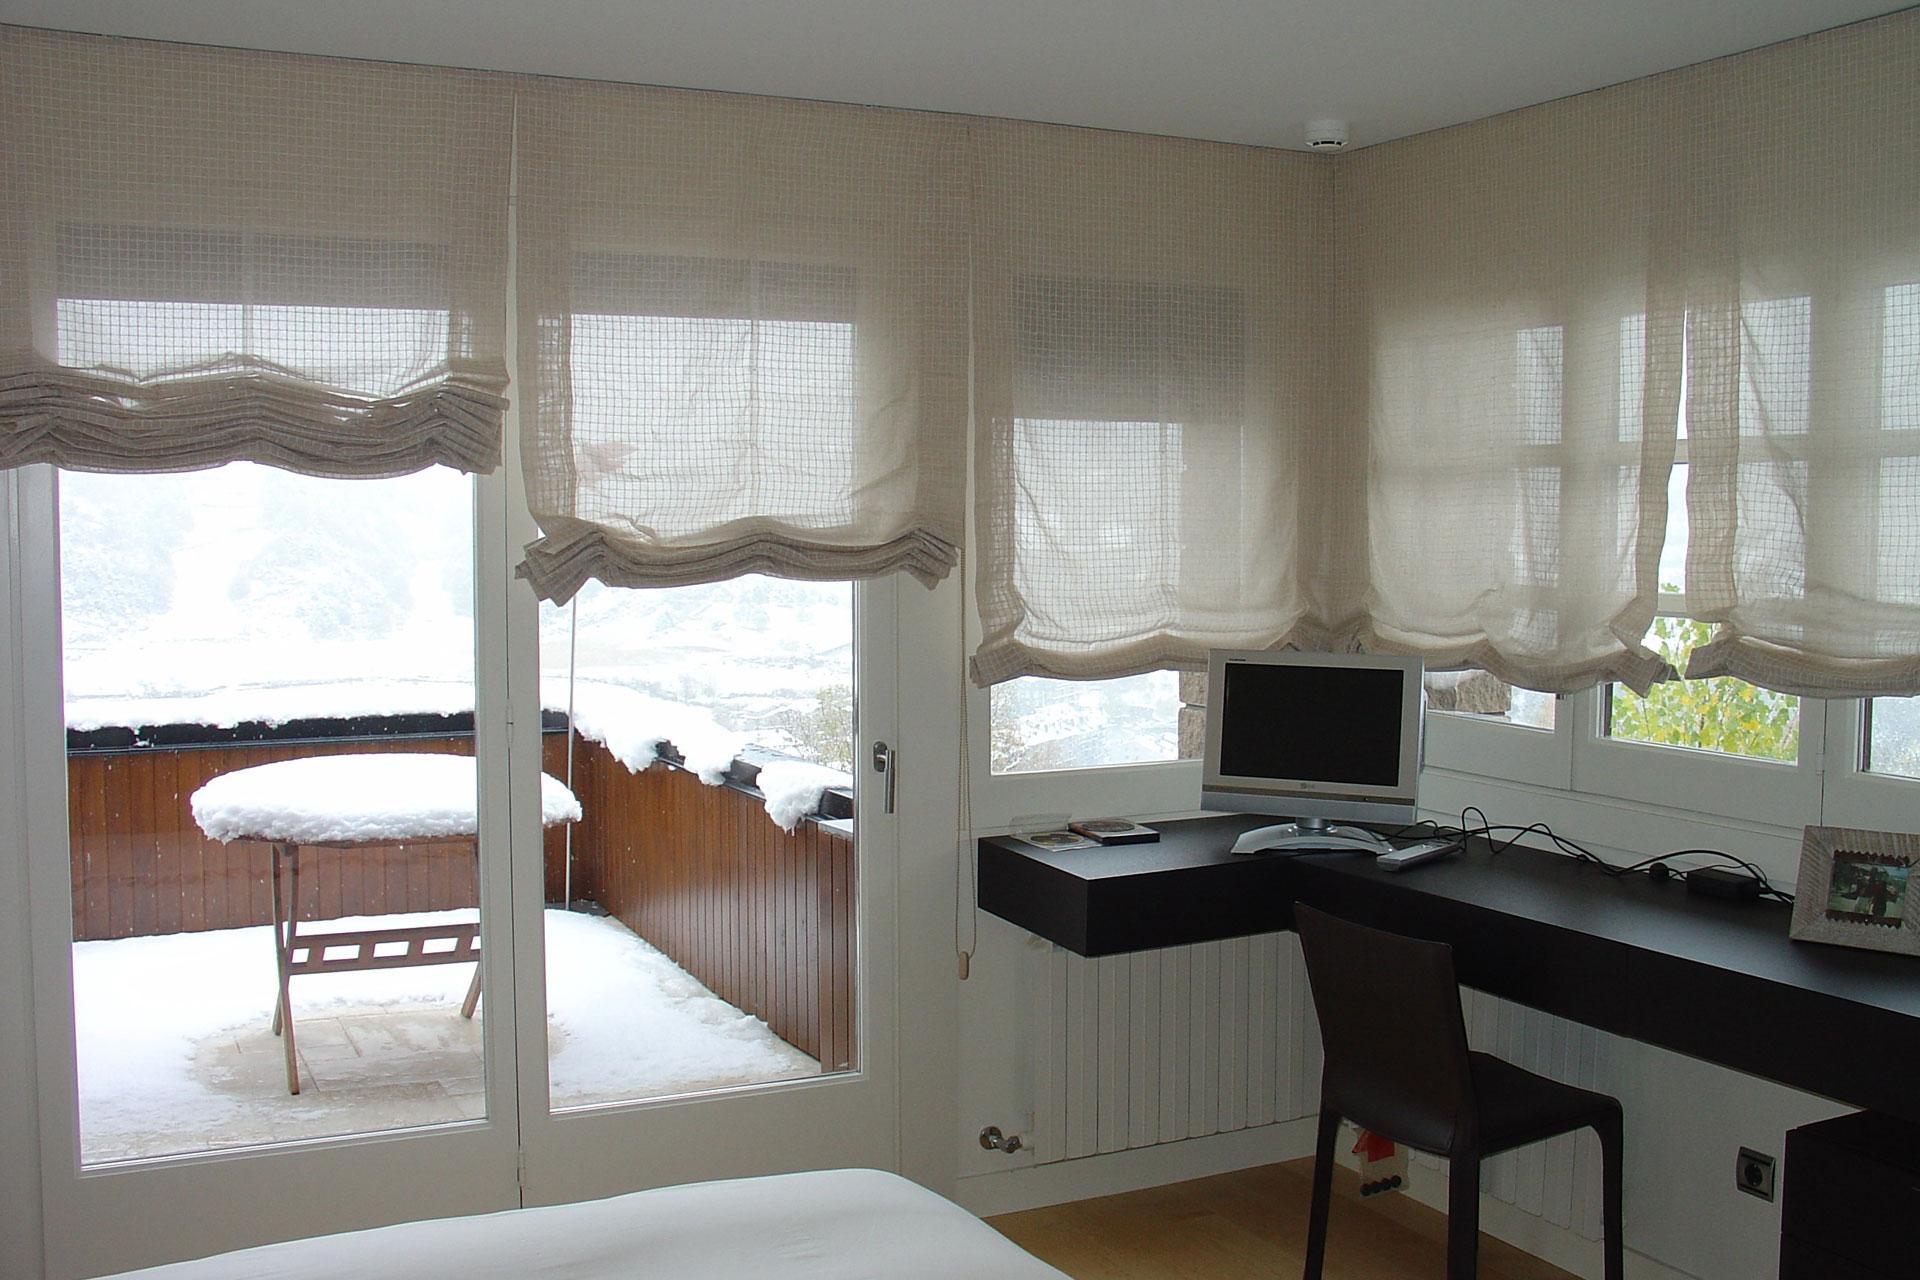 Cortinas a medida en barcelona cortinas vall s for Argollas para cortinas